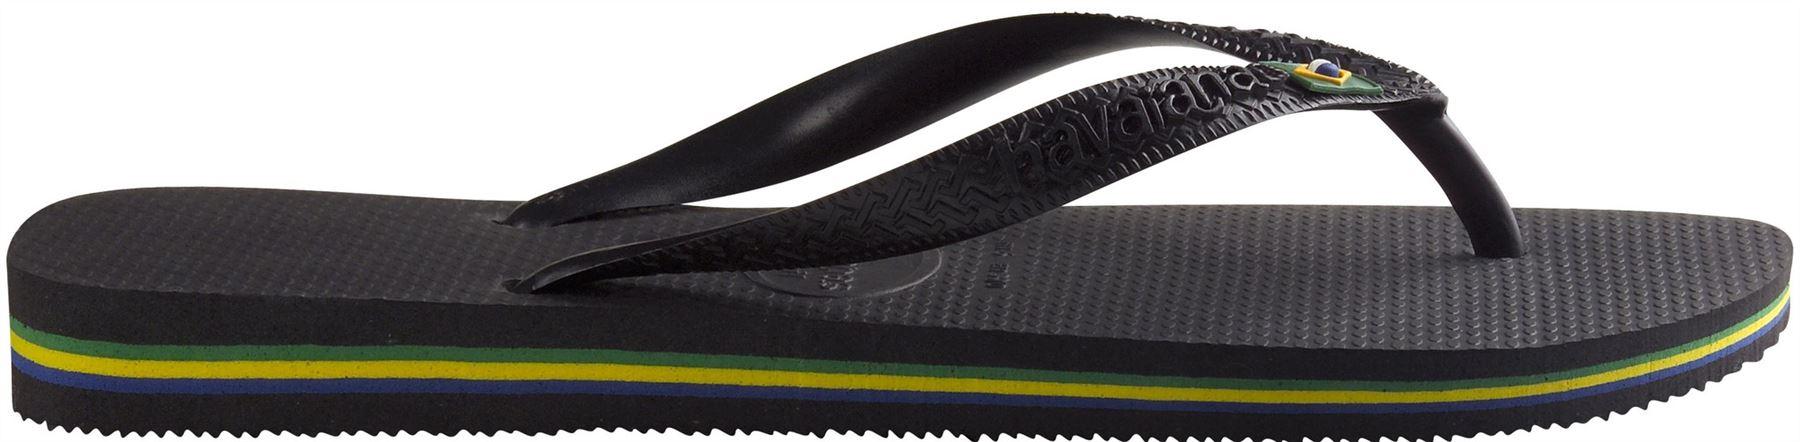 Havaianas-Brasil-Brazil-Flip-Flops-Various-Colours-amp-Sizes